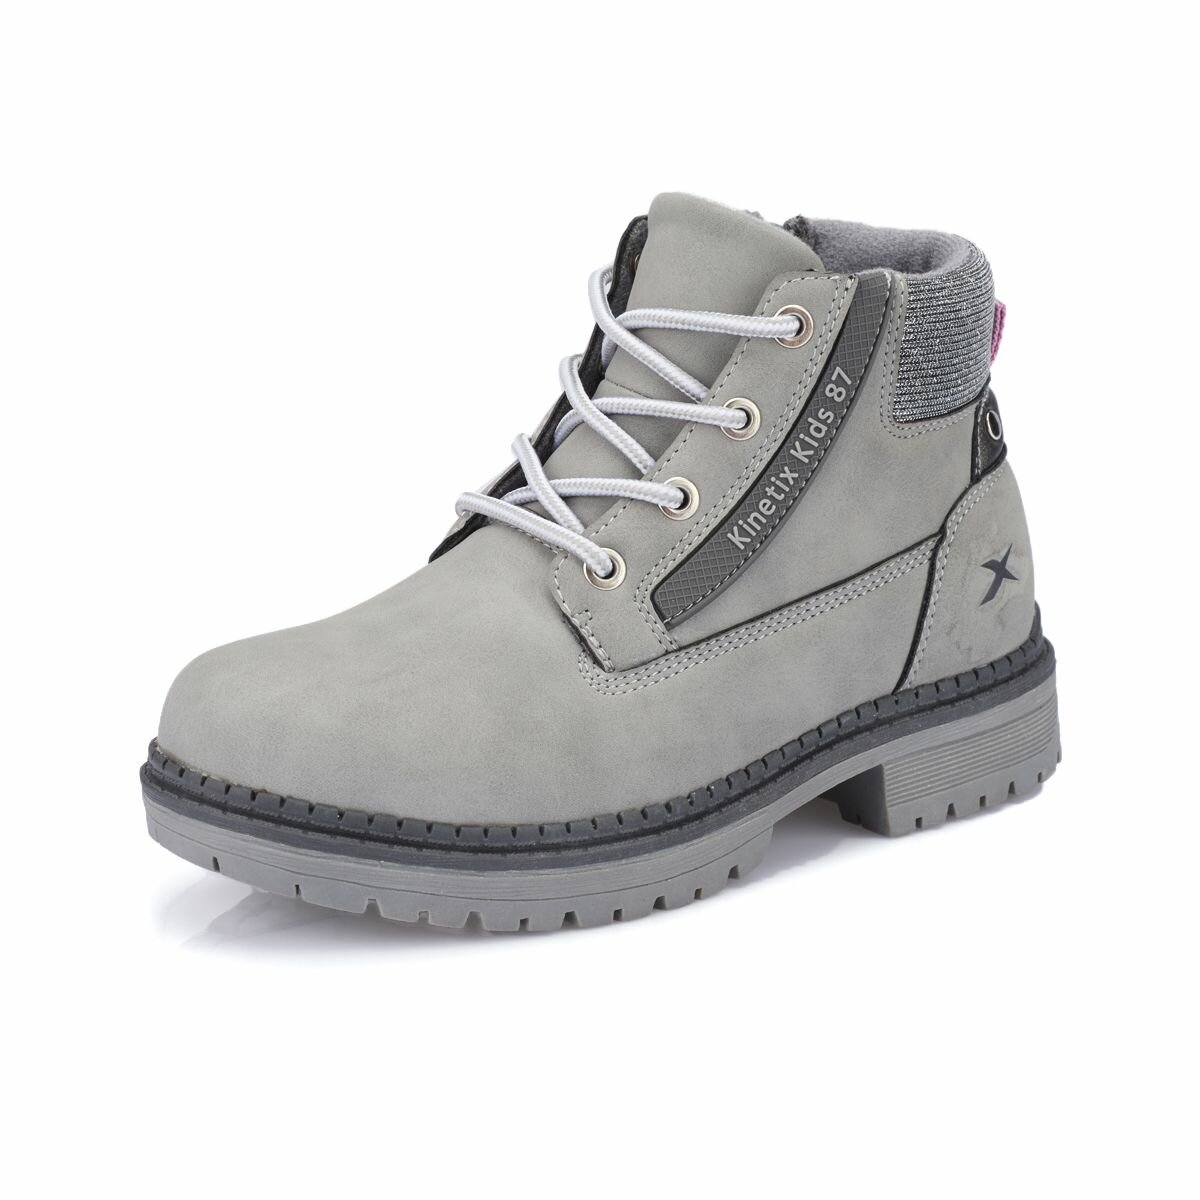 FLO BENMAR Gray Female Child Boots KINETIX